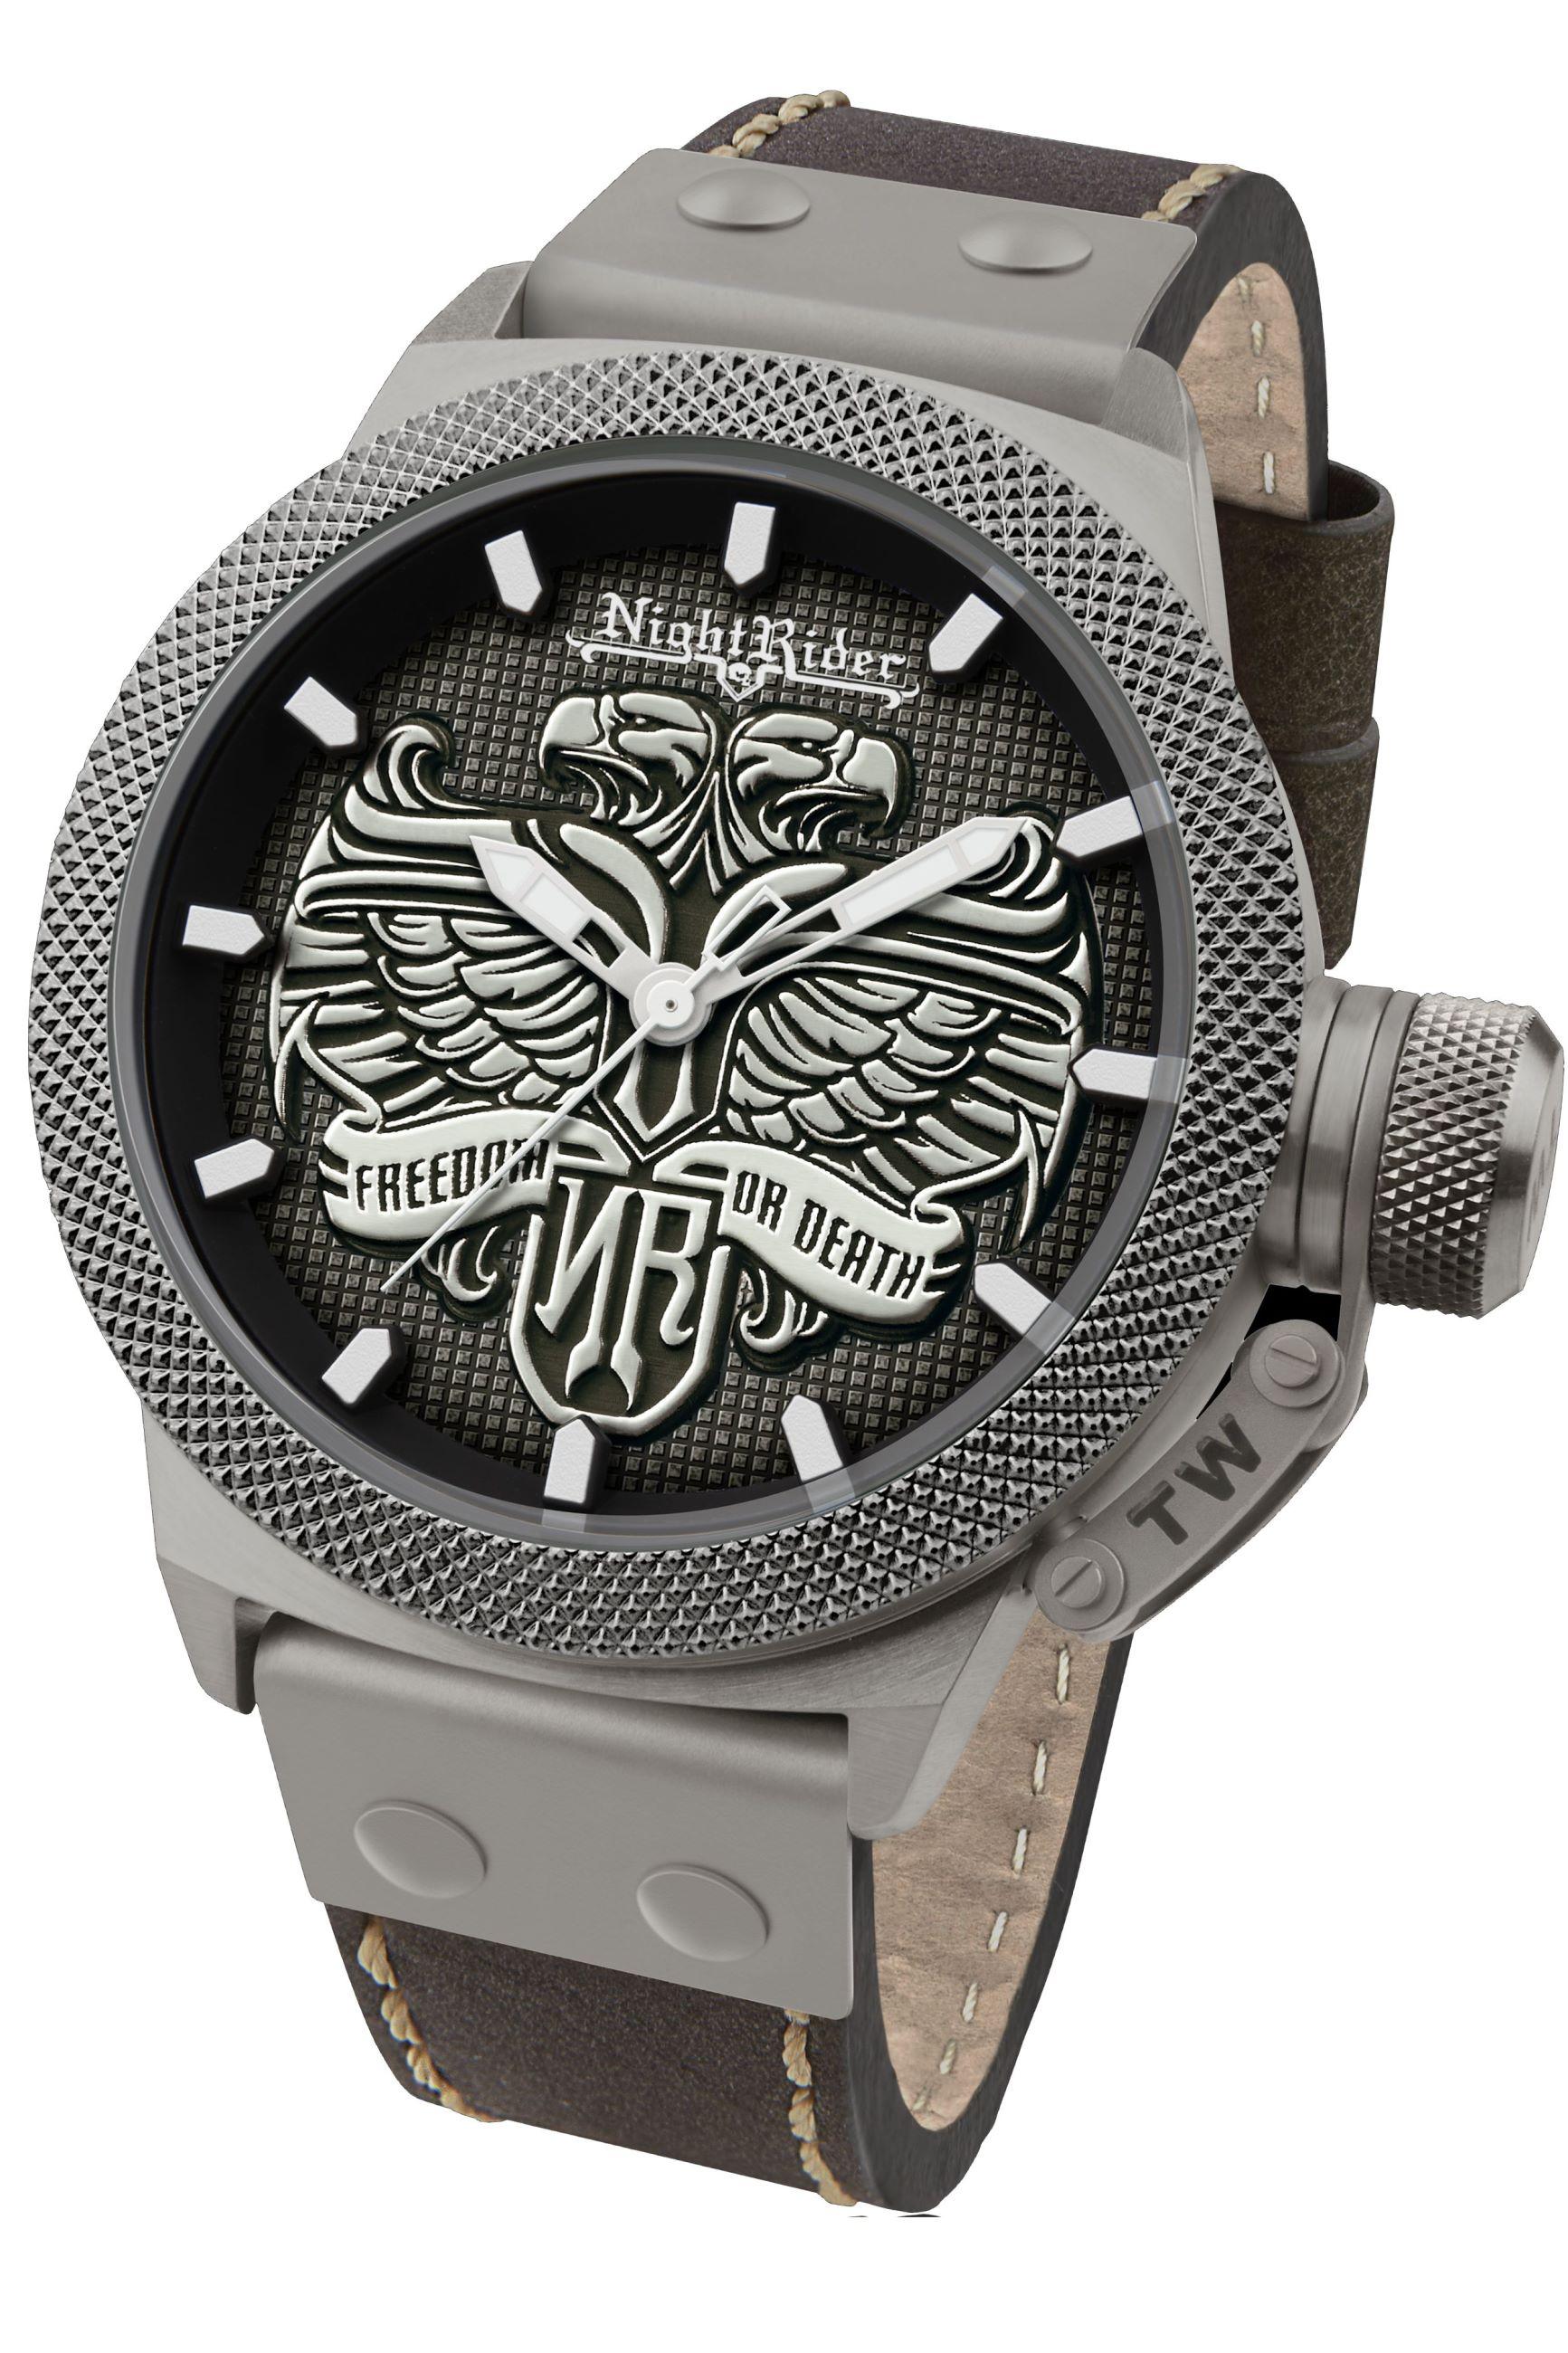 TW STEEL -Night Rider Special Edition Armbanduhr Nr. 1